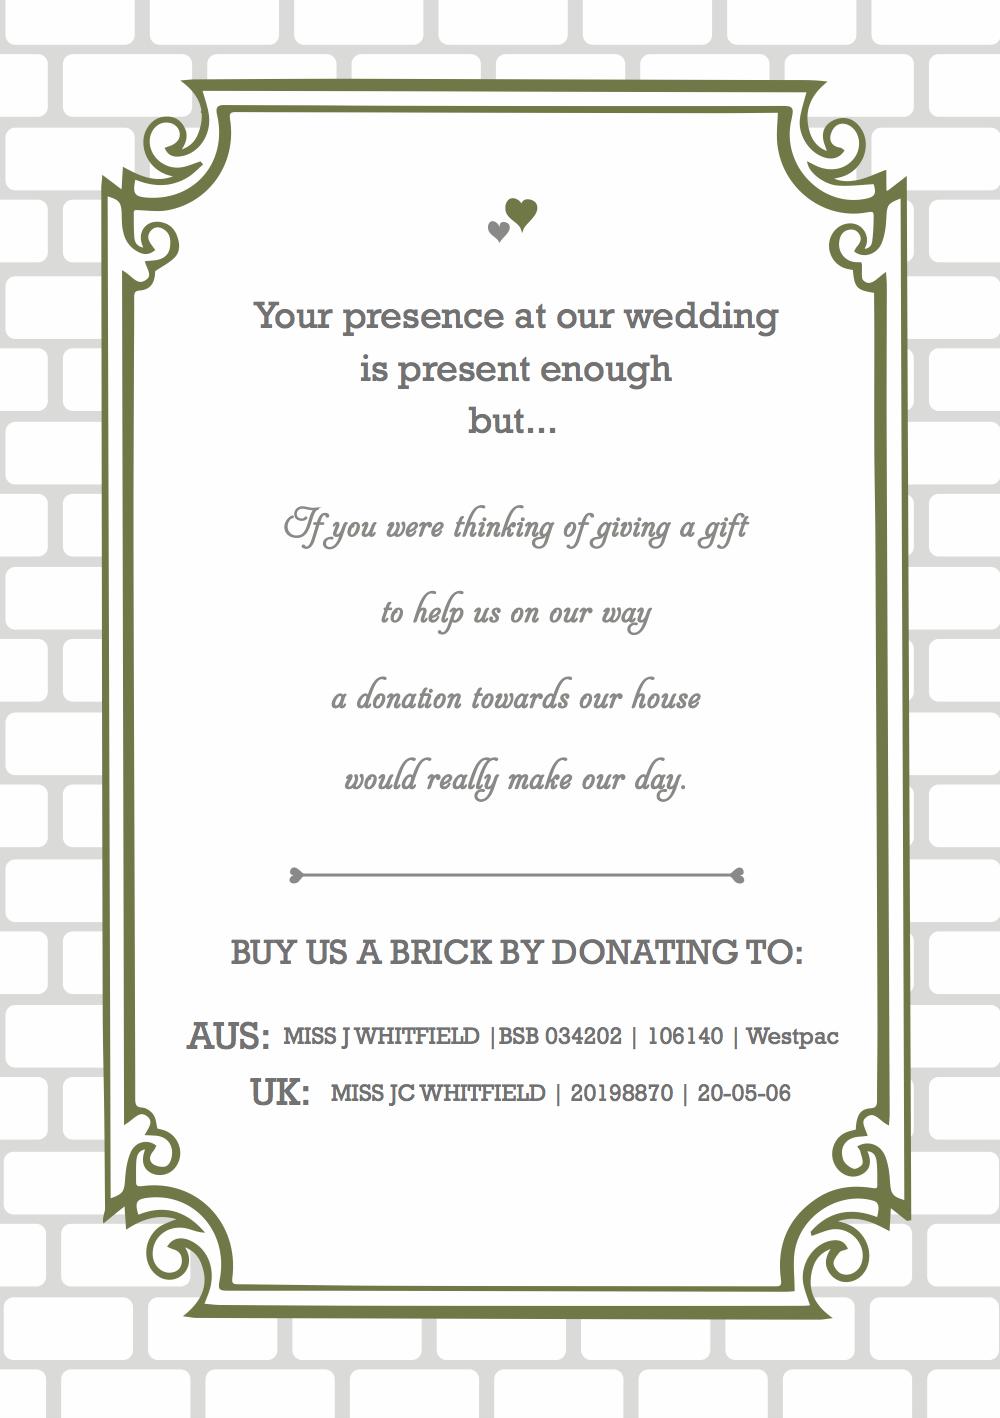 Wedding_Stationery_personalised_bespoke_design.png